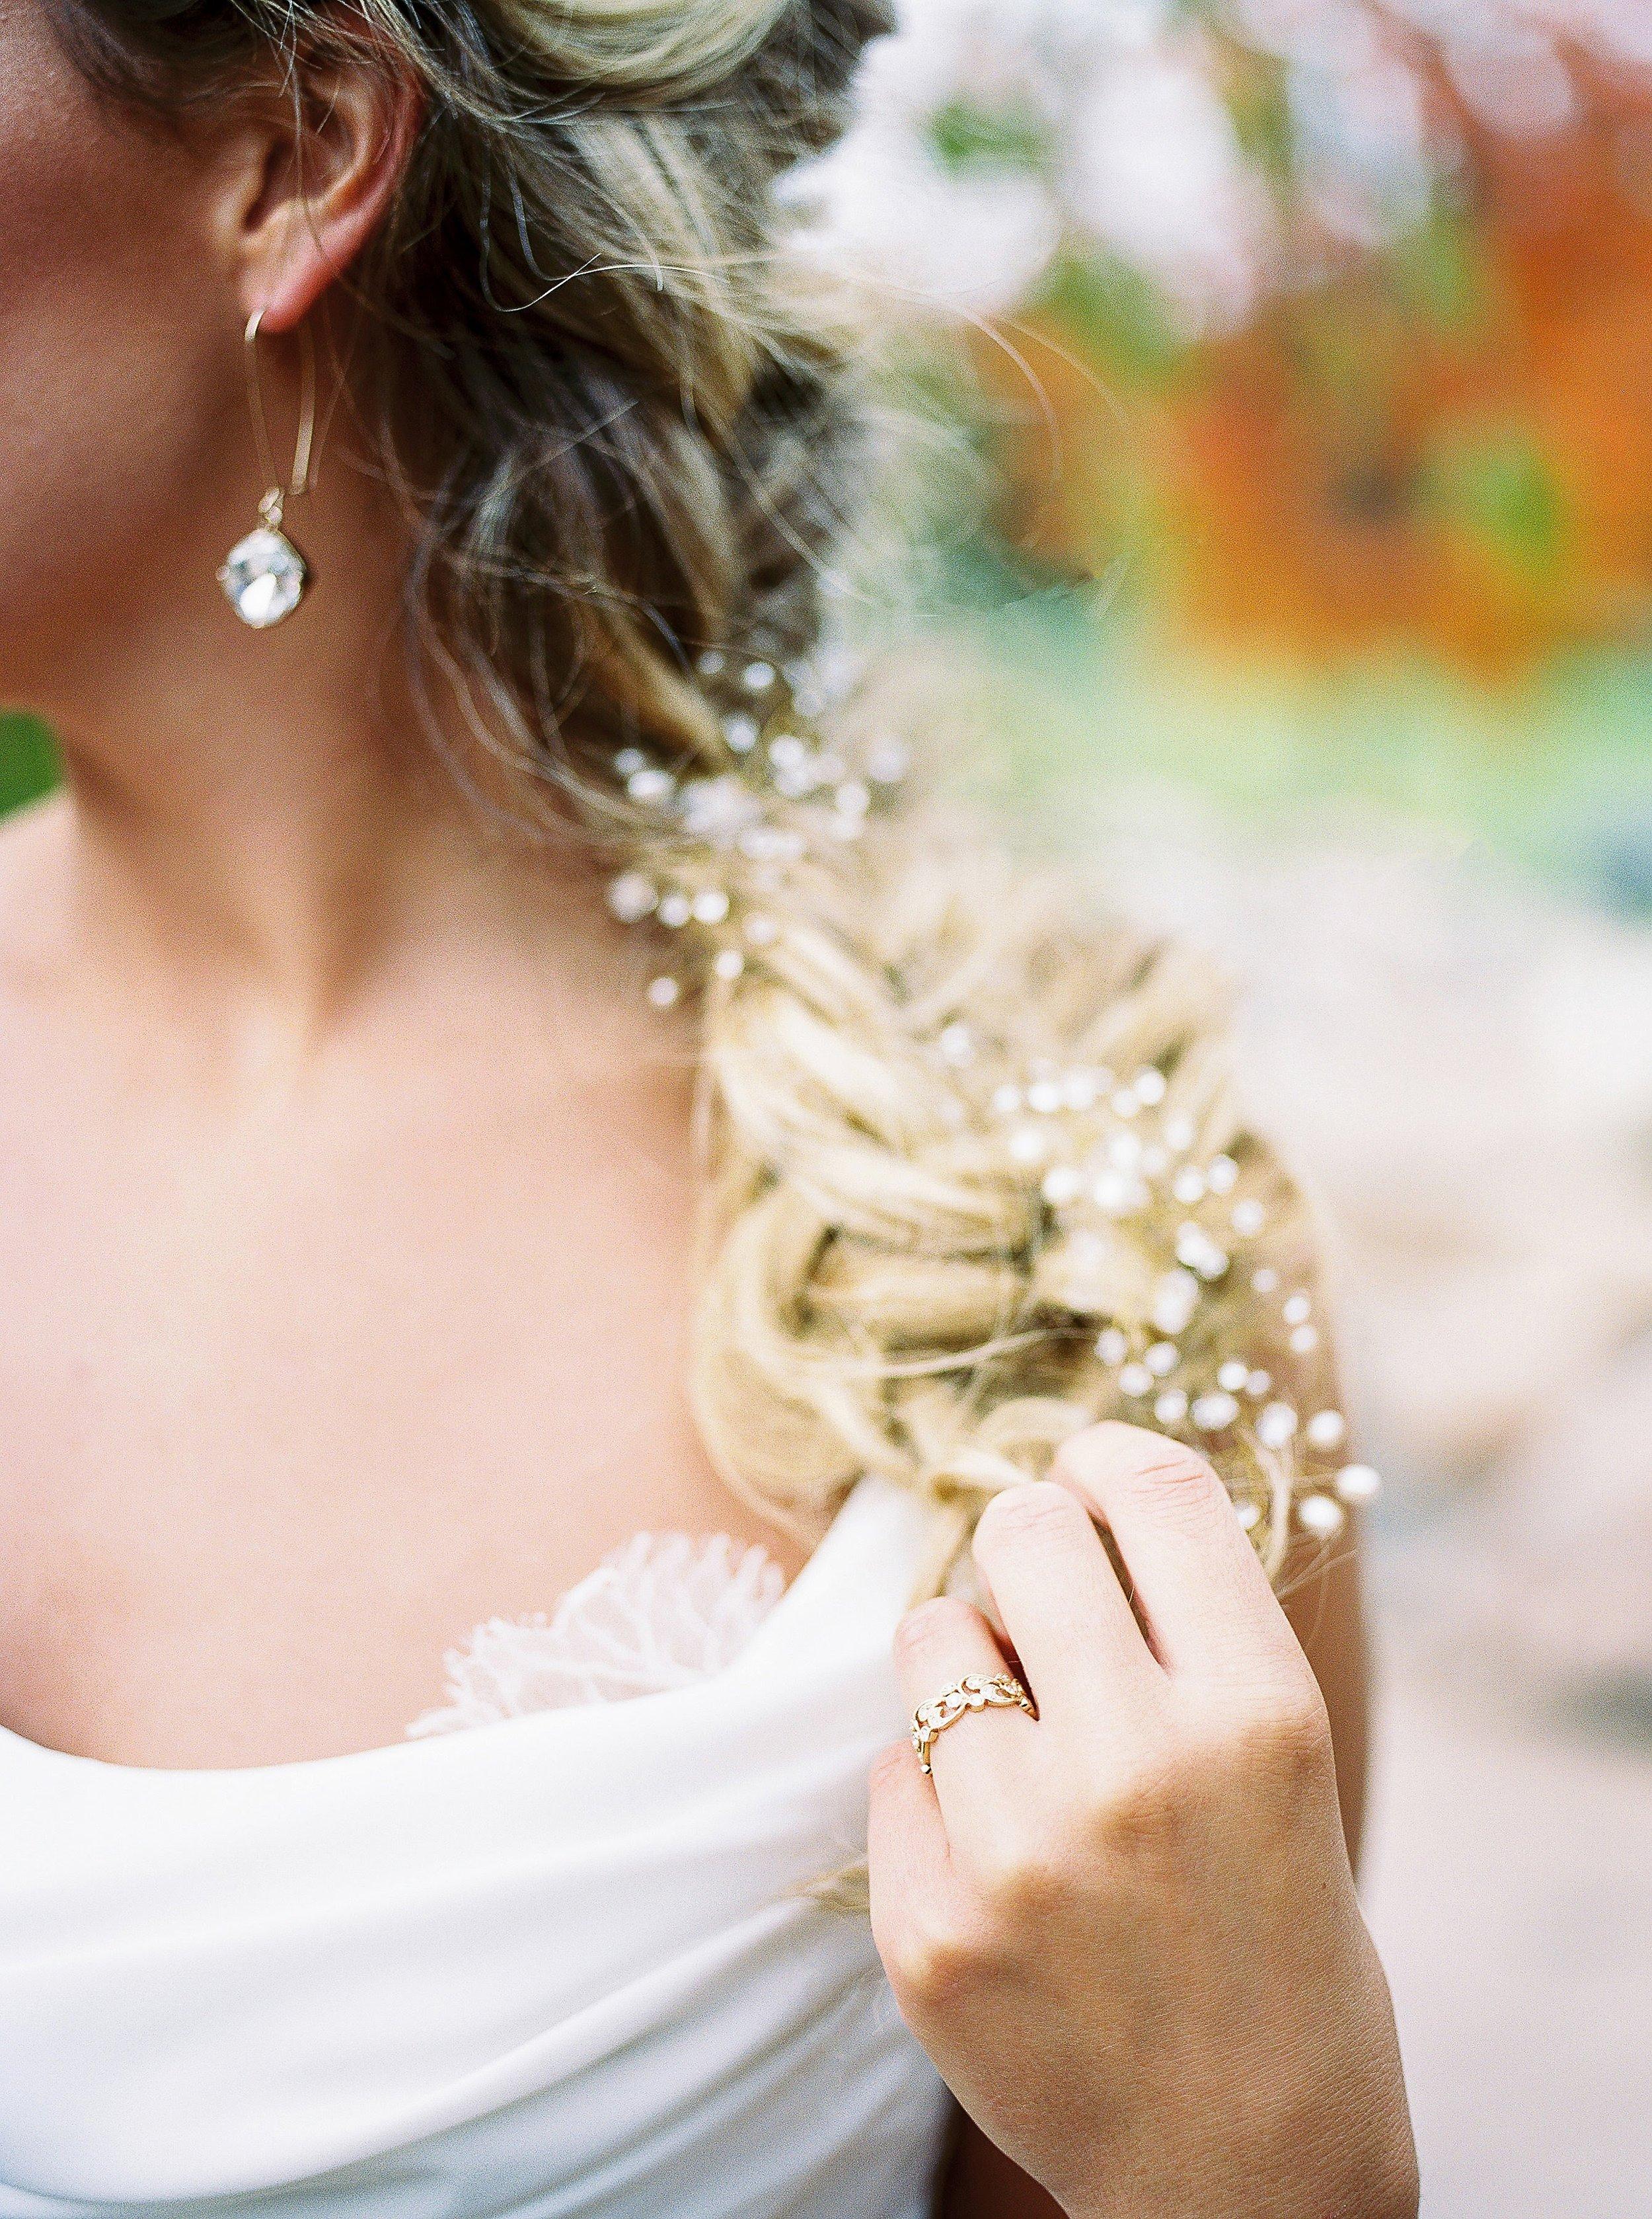 Alexandra-Elise-Photography-Ali-Reed-Film-Wedding-Photographer-Deerfield-Country-Club-016.jpg